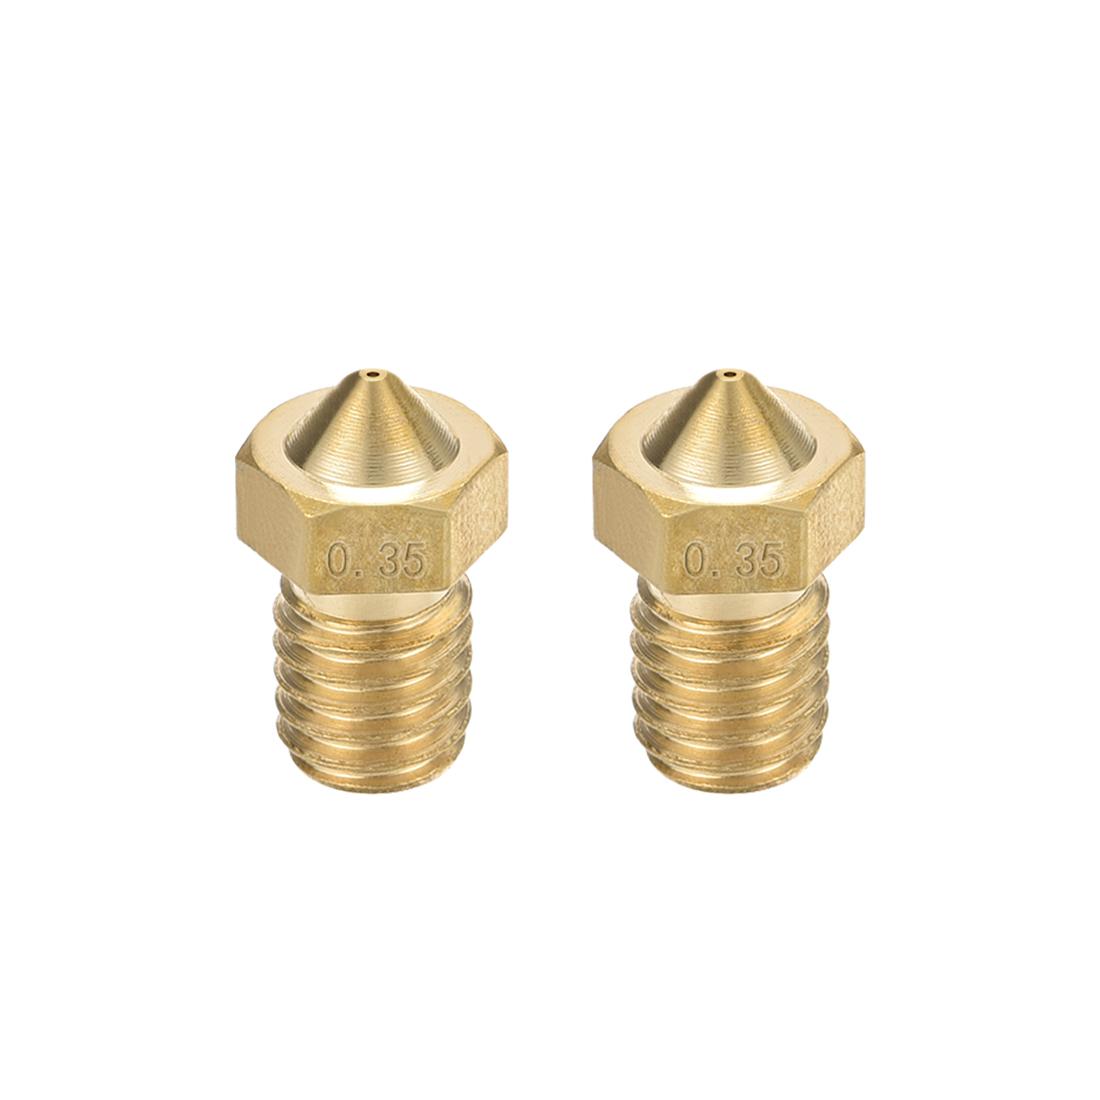 0.35mm 3D Printer Nozzle, Fit for V6, for 1.75mm Filament Brass 2pcs